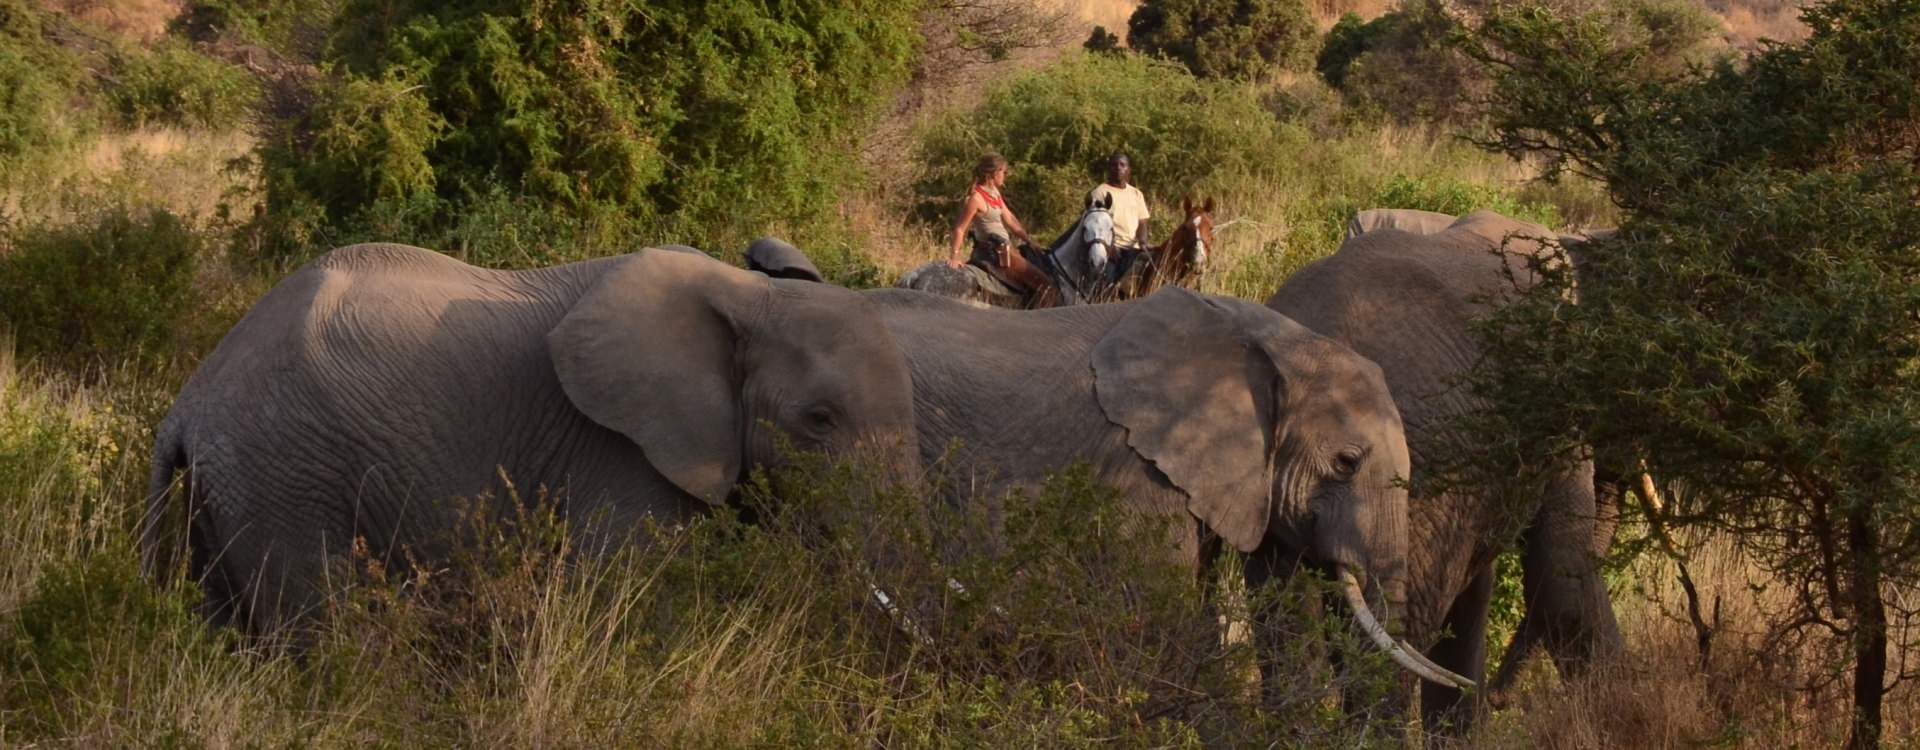 Horseback safari in Tanzania